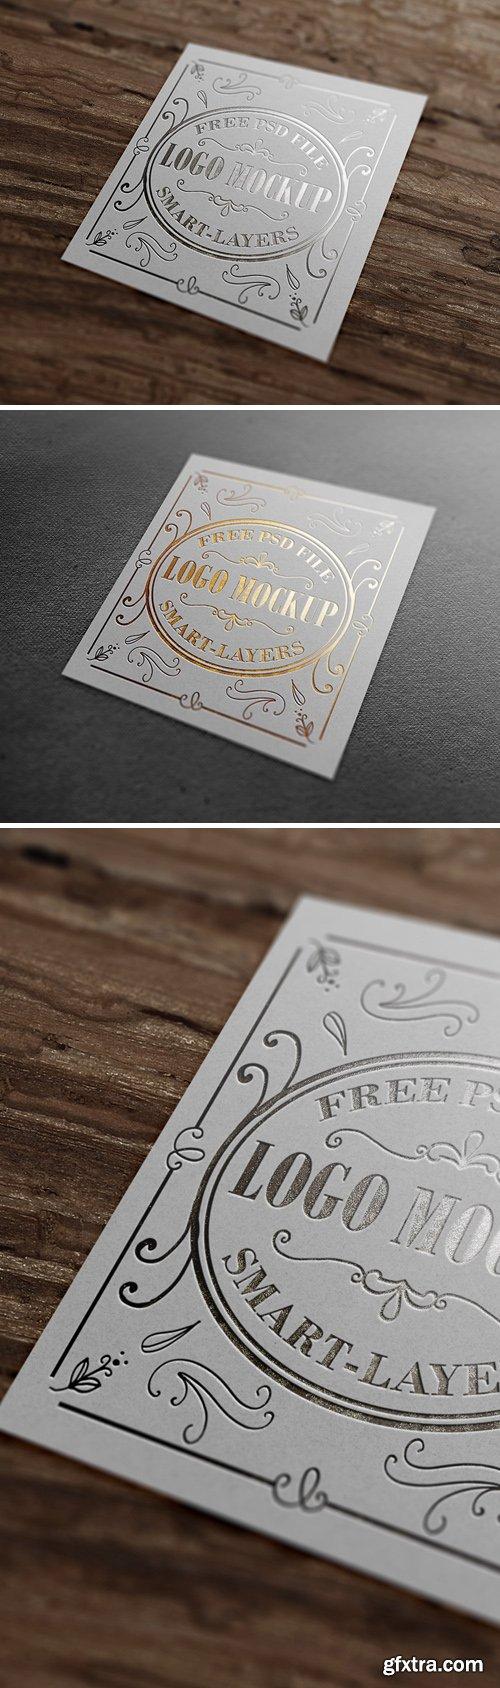 Gold & Silver Stamping Logo Mockup